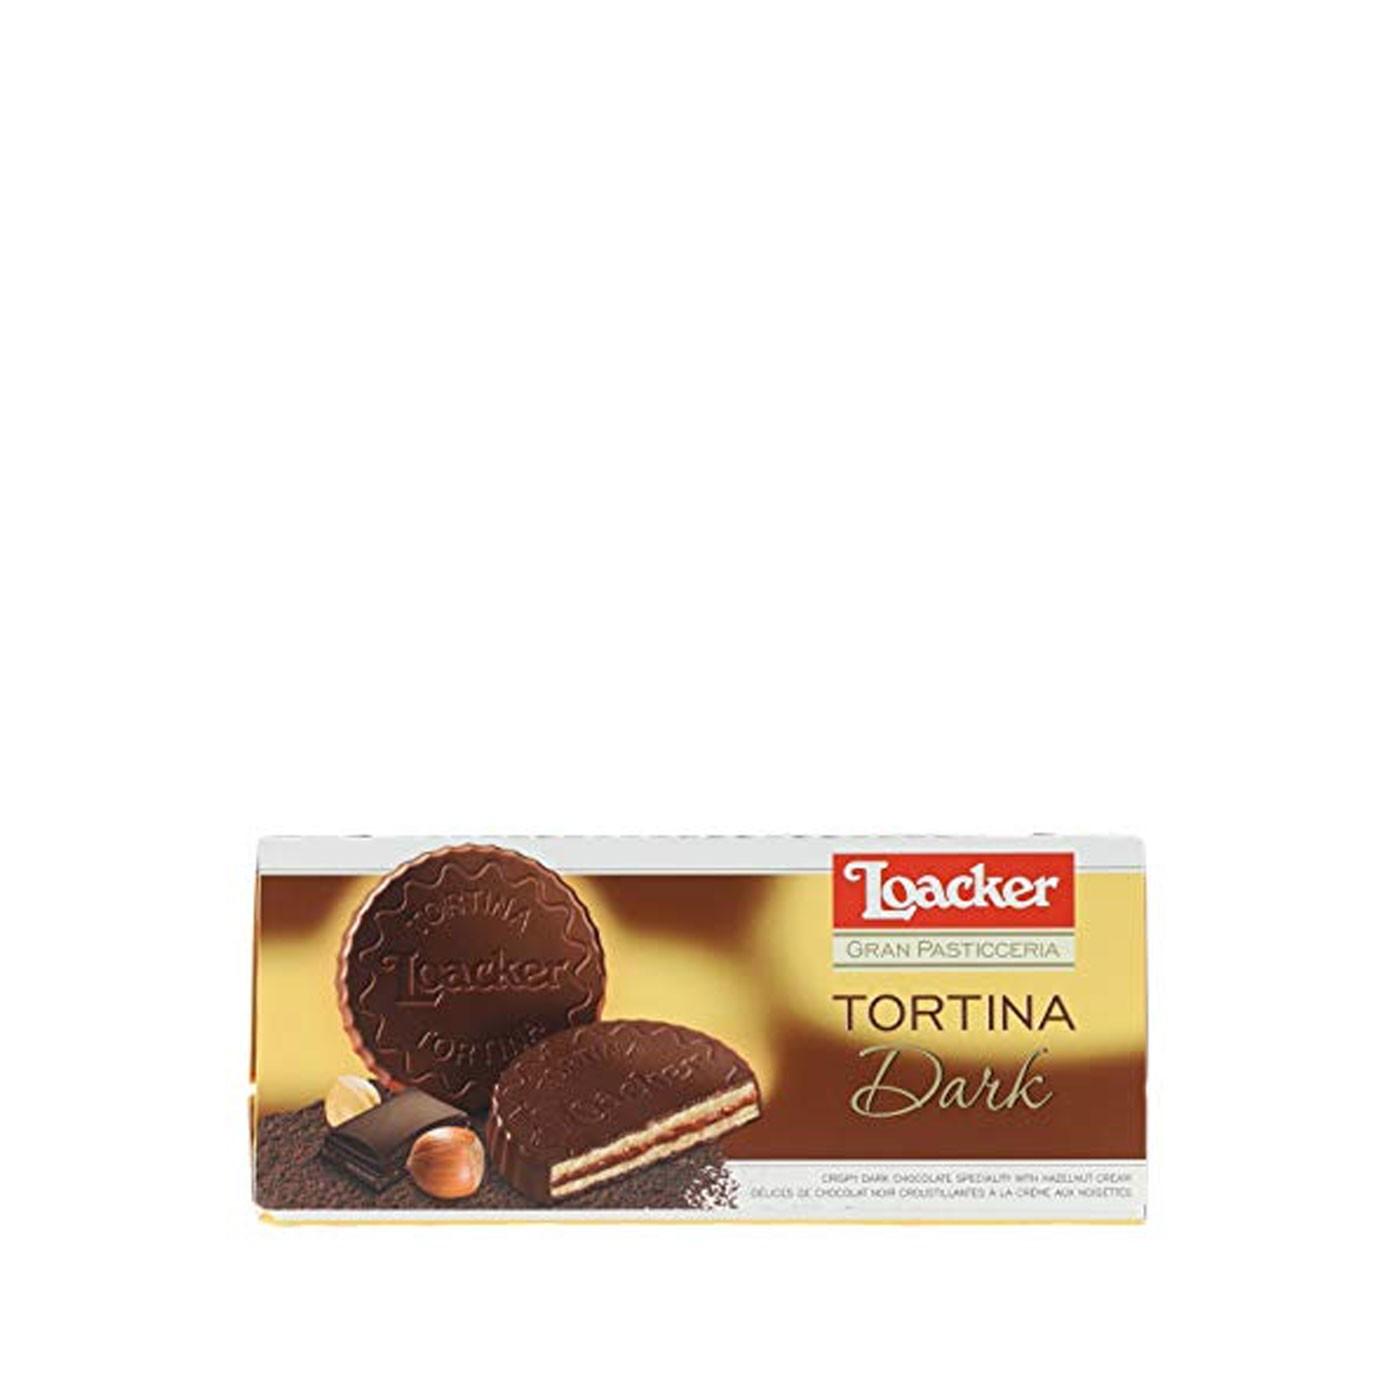 Gran Pasticceria Tortina Dark Noir 4.4 oz